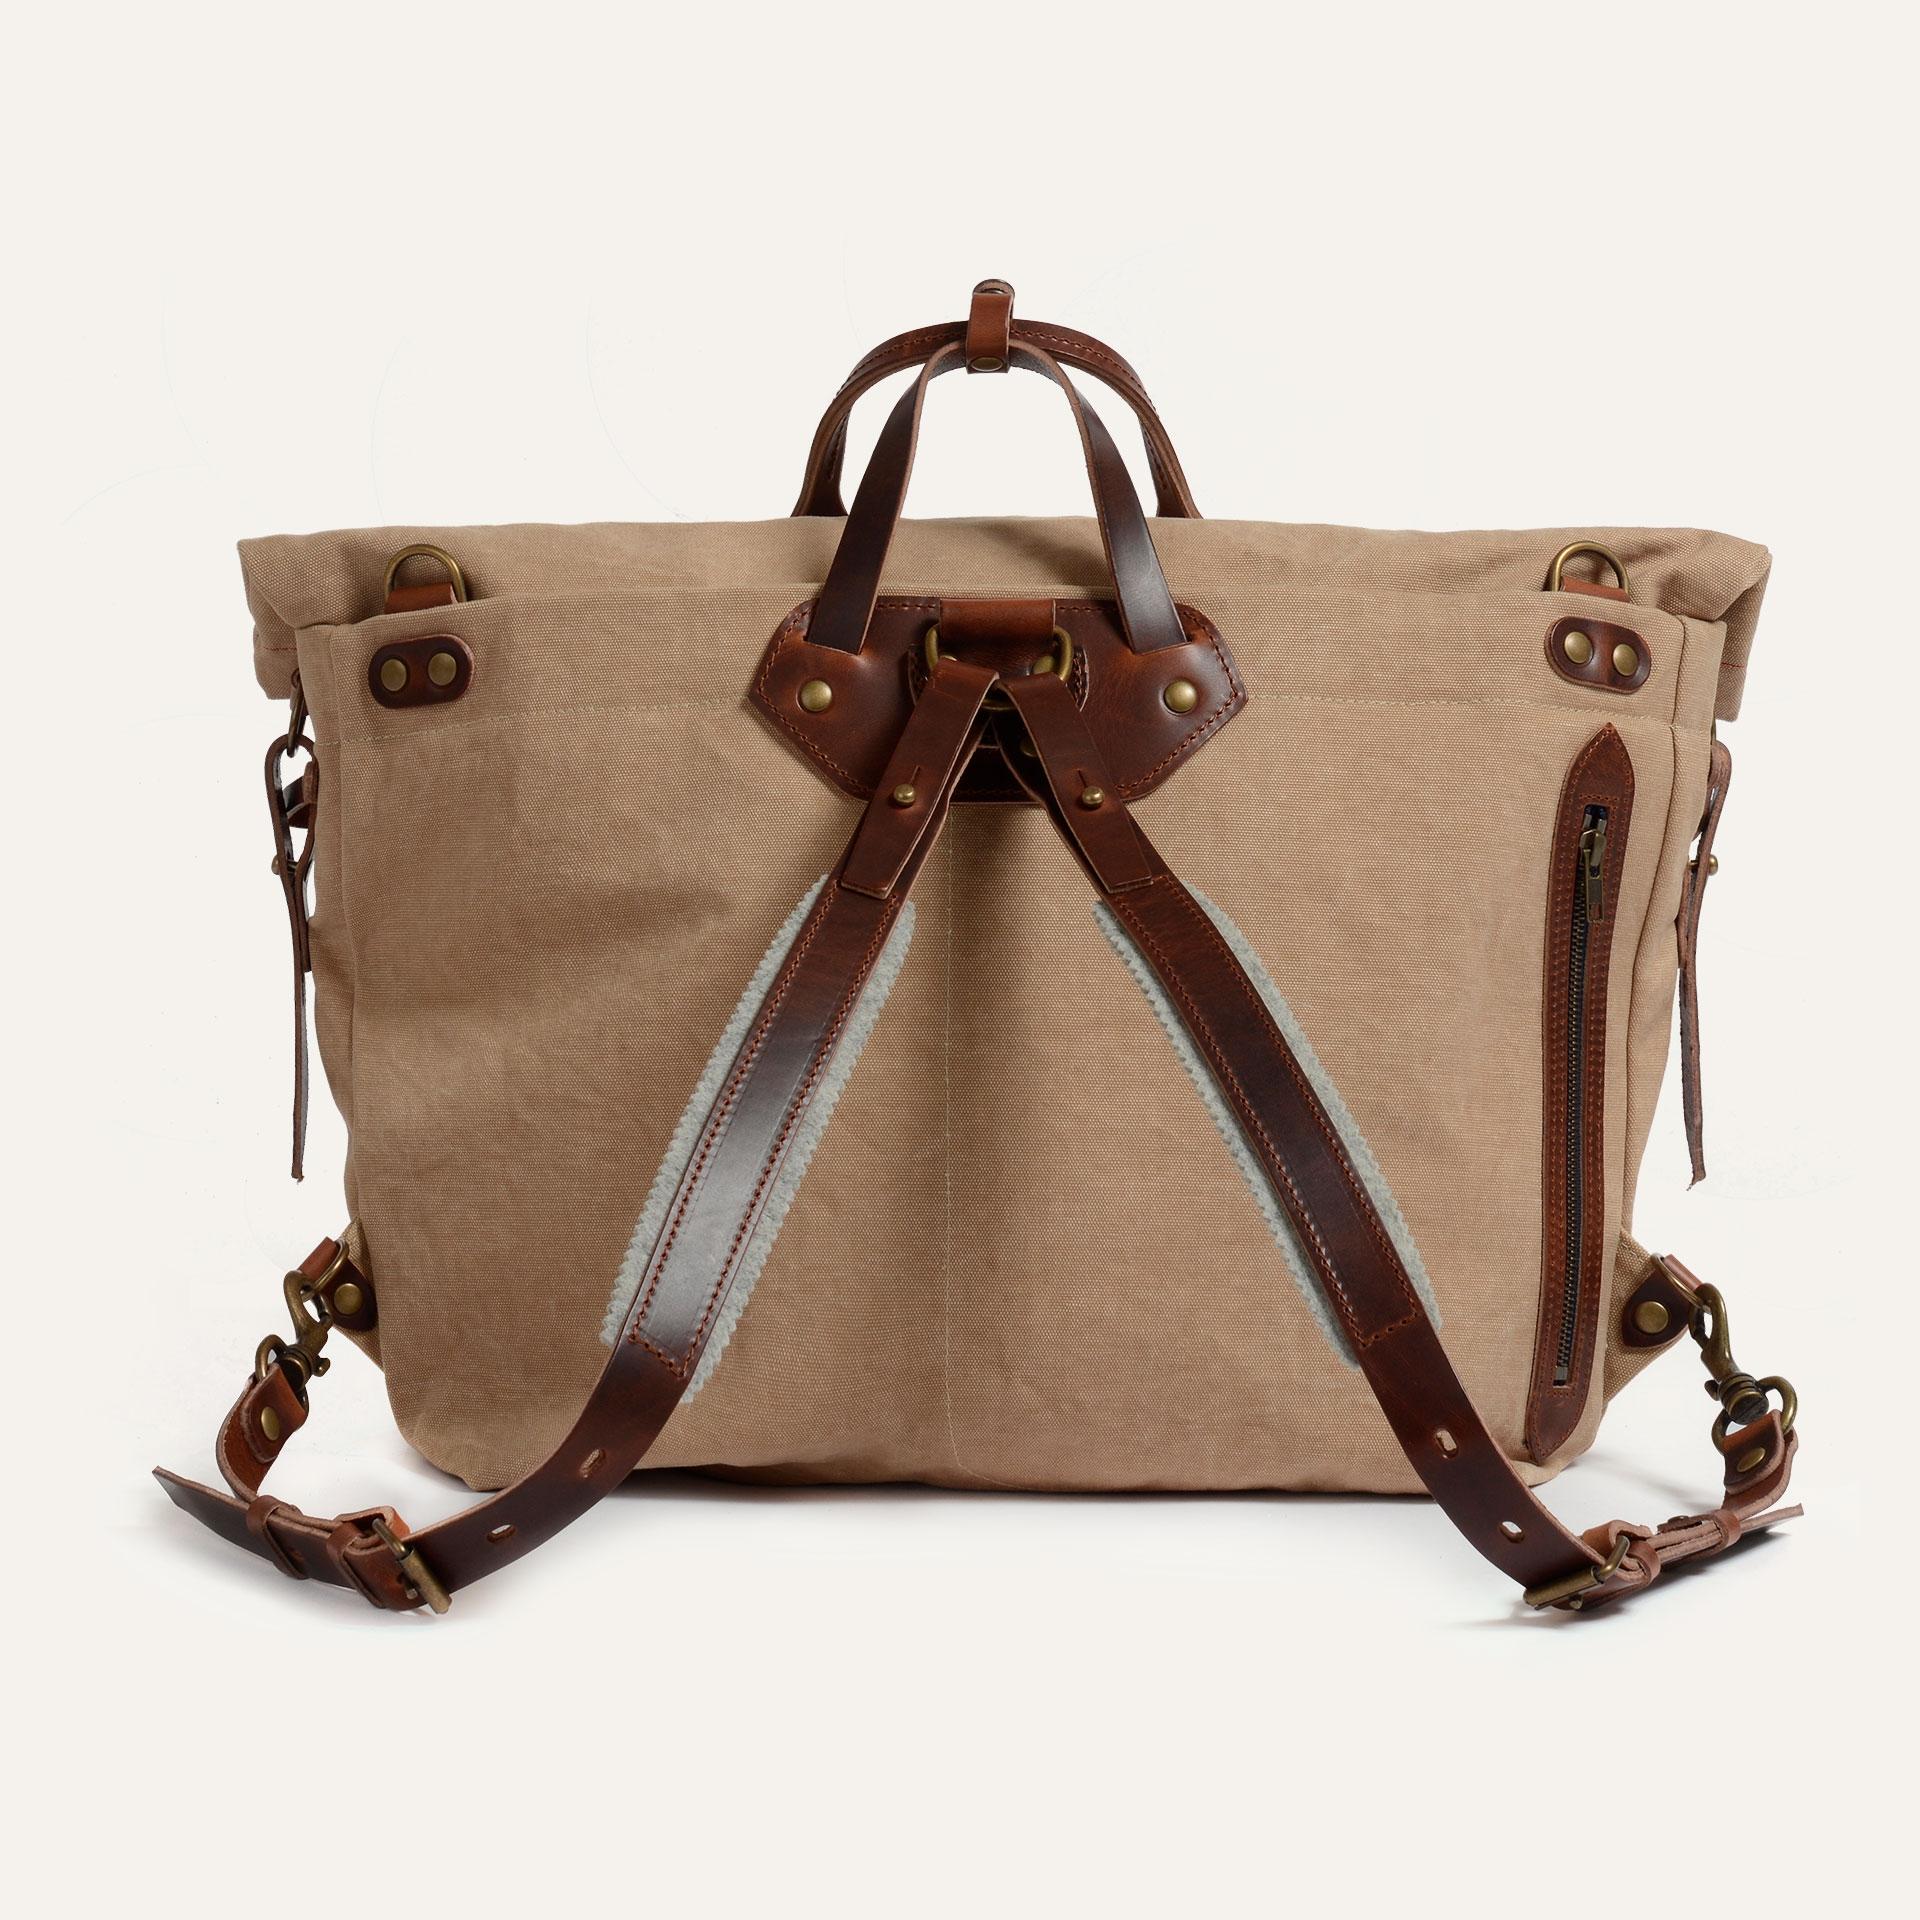 Woody L Backpack - Wheat  (image n°3)